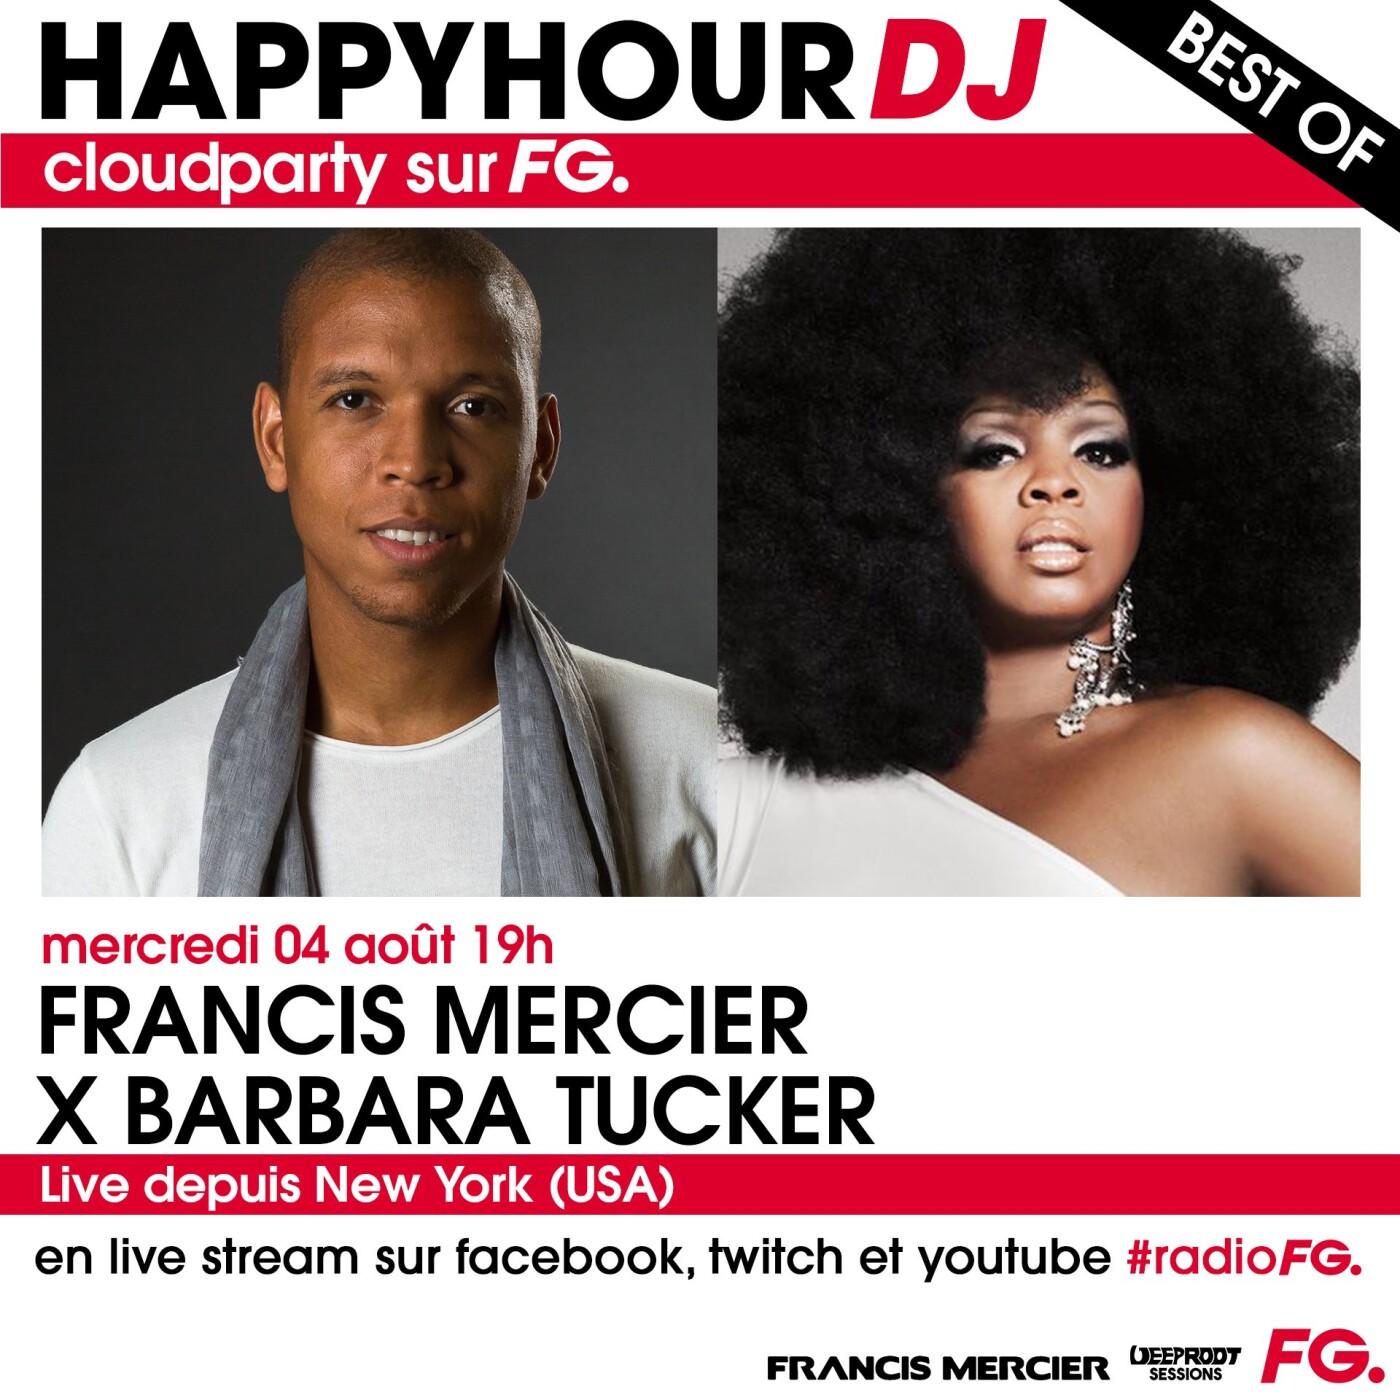 HAPPY HOUR DJ BEST OF : FRANCIS MERCIER X BARBARA TUCKER